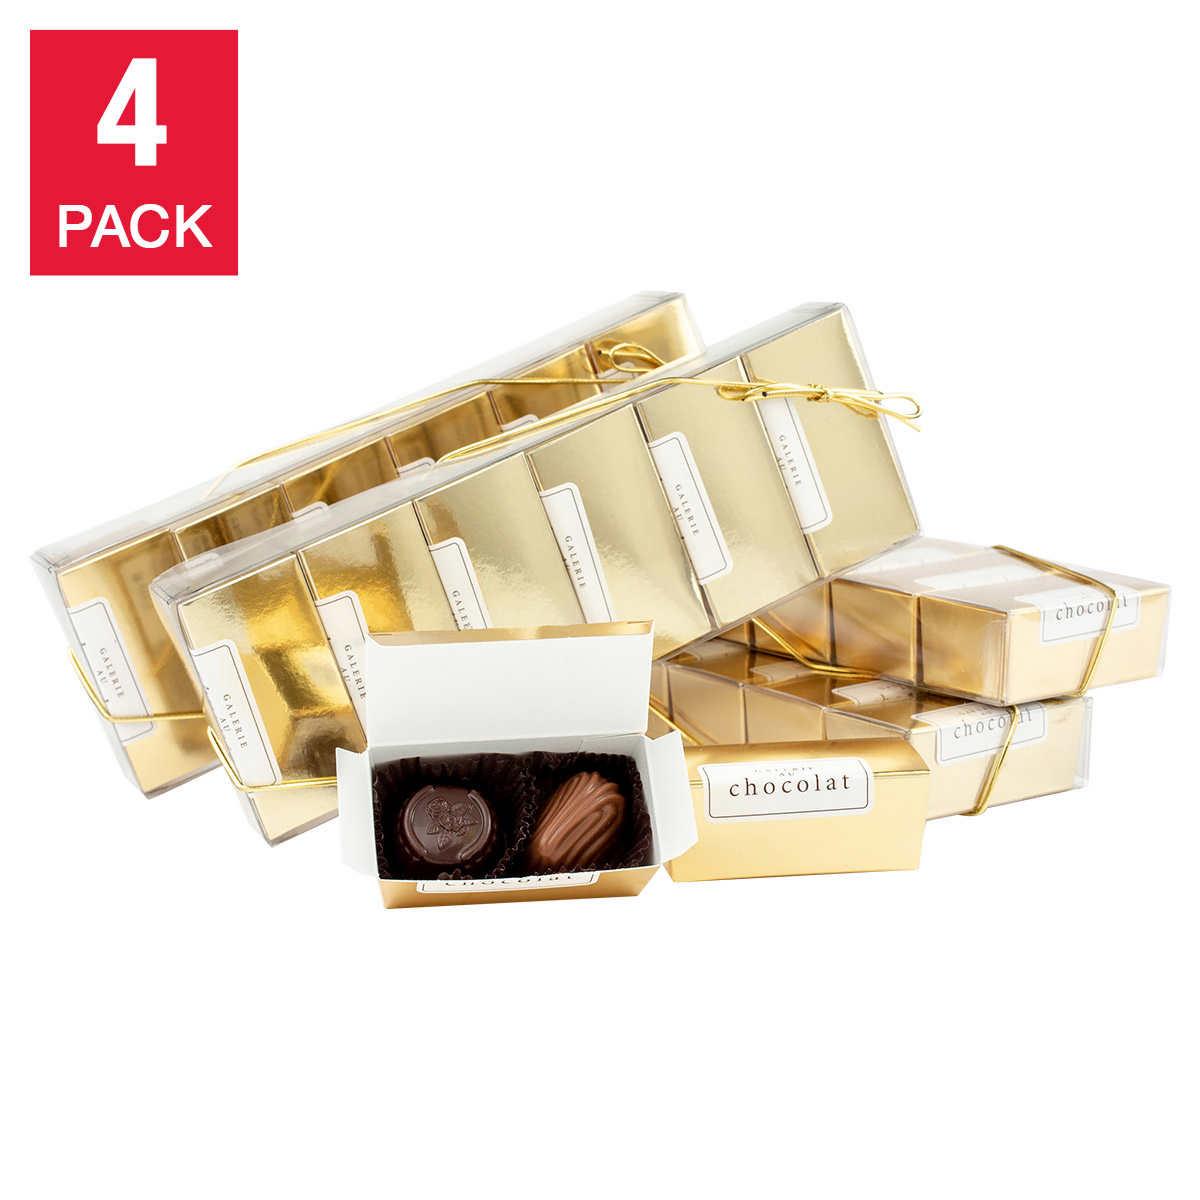 Galerie Au Chocolat Gold Belgian Chocolate Gift Box 4 Pack